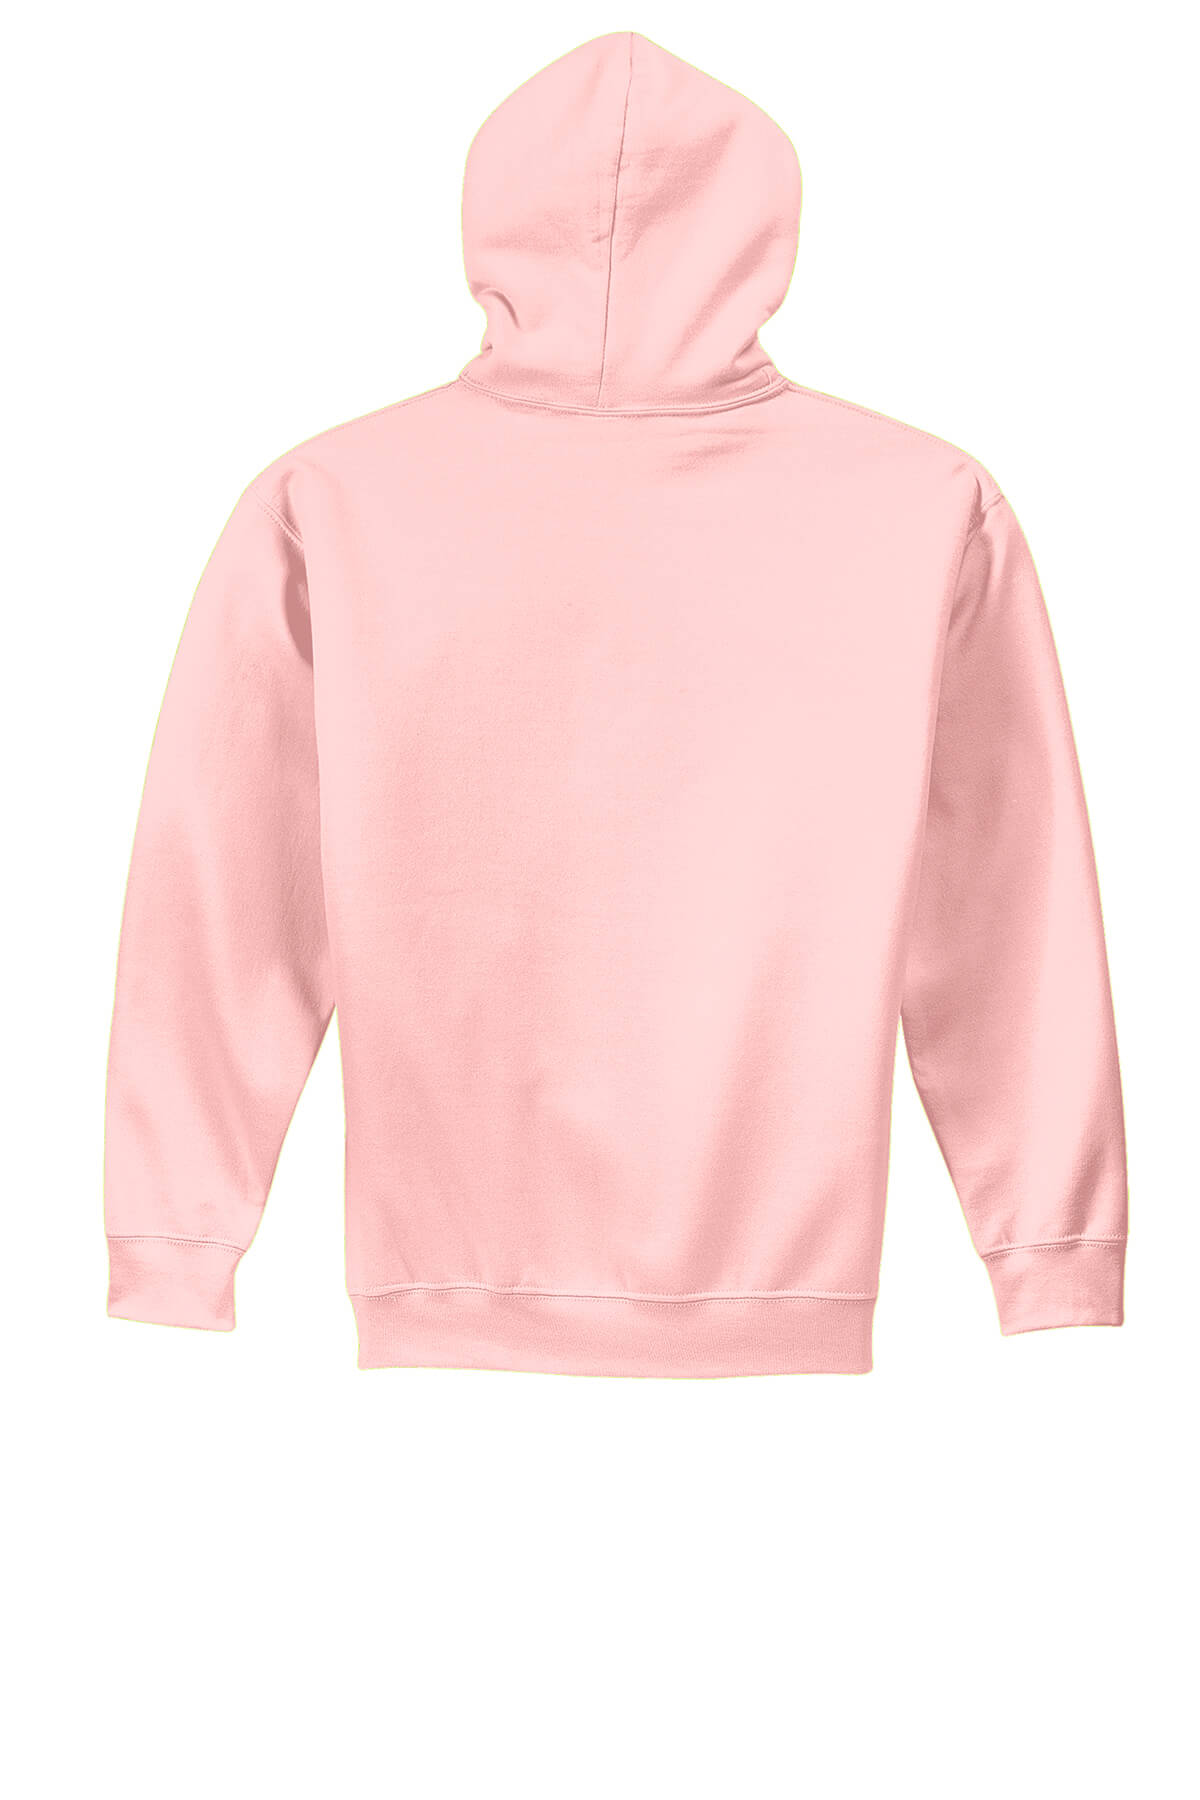 18500-light-pink-6